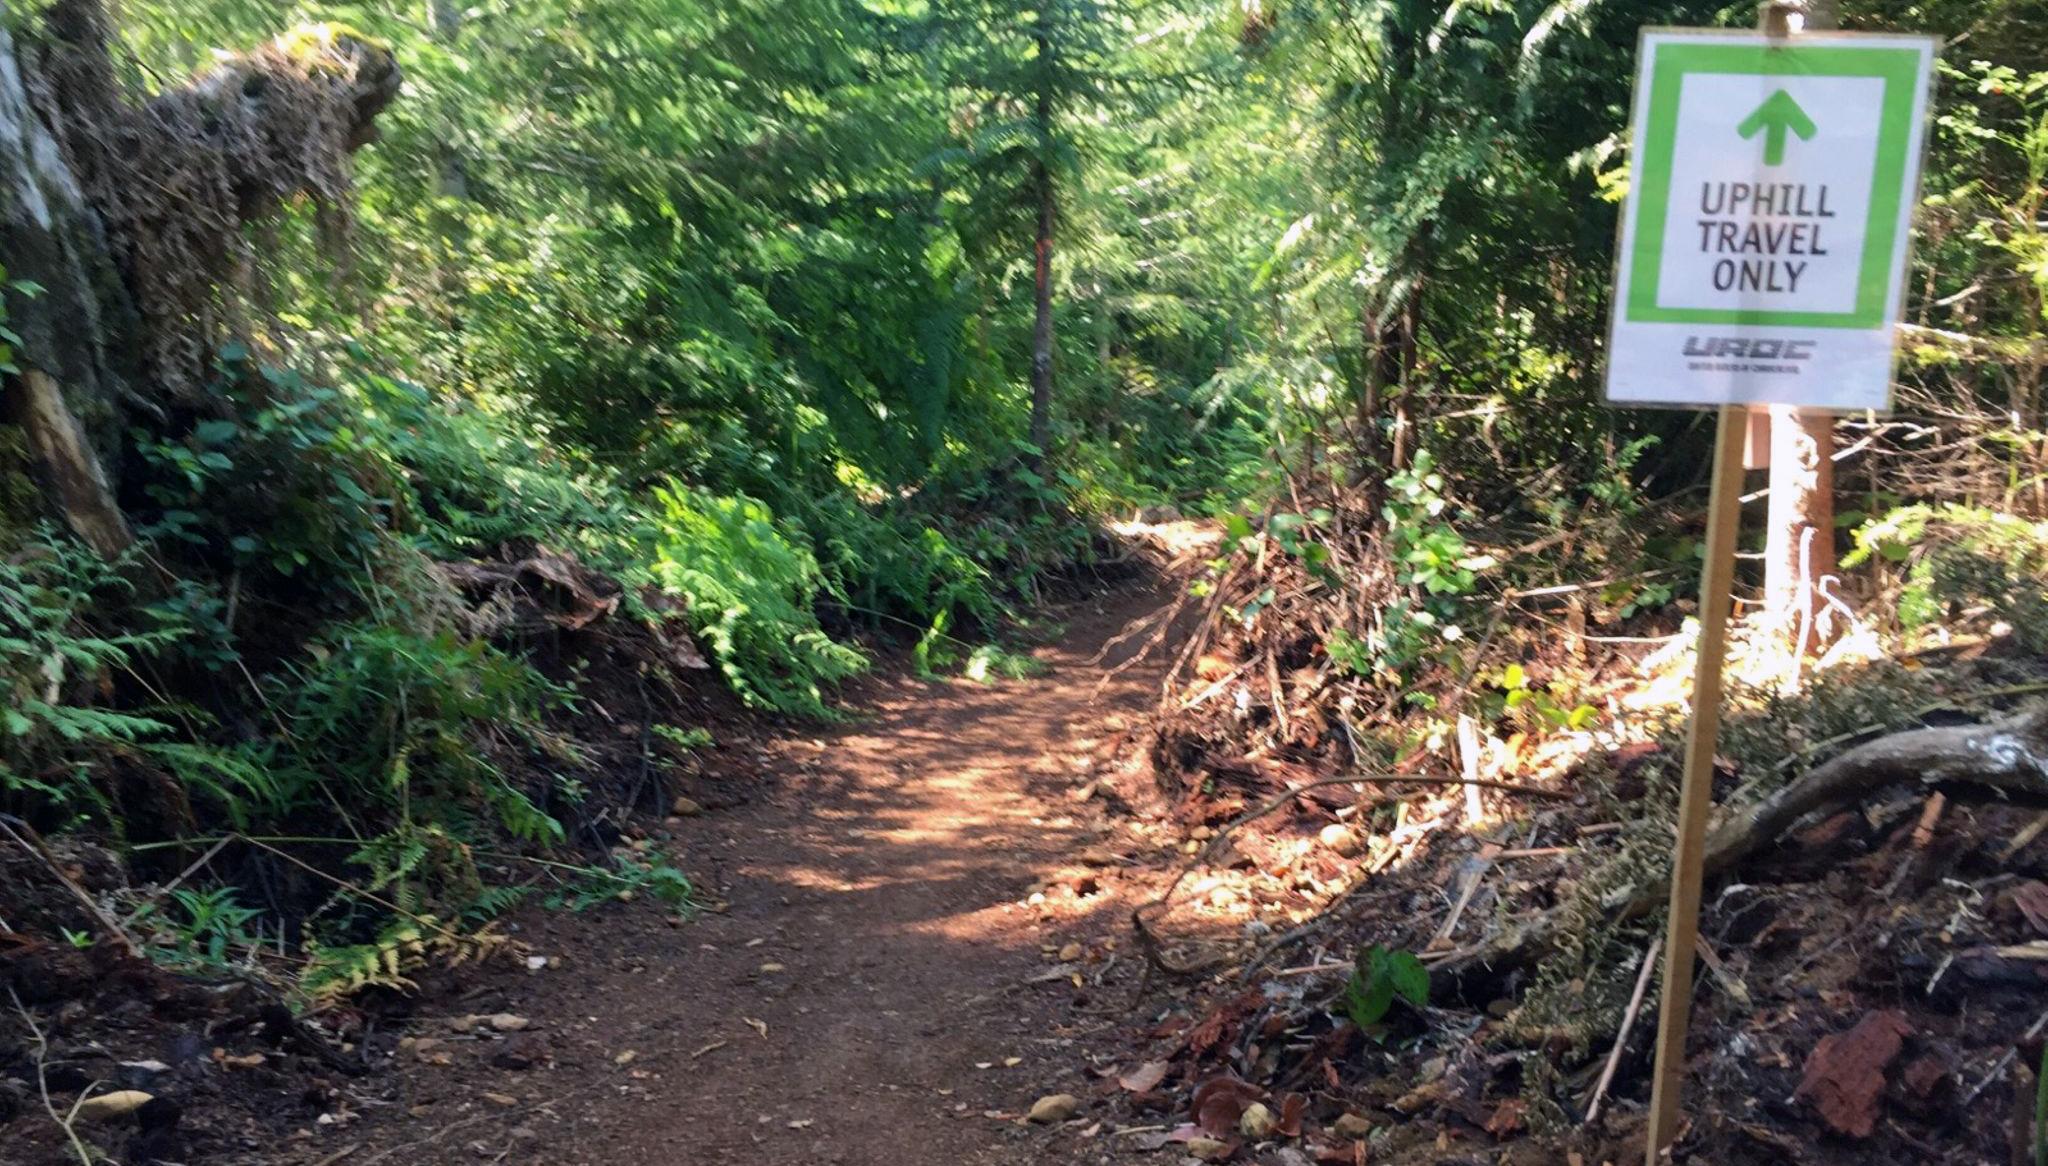 Trail Bicycles Bike Course change: climbing trail